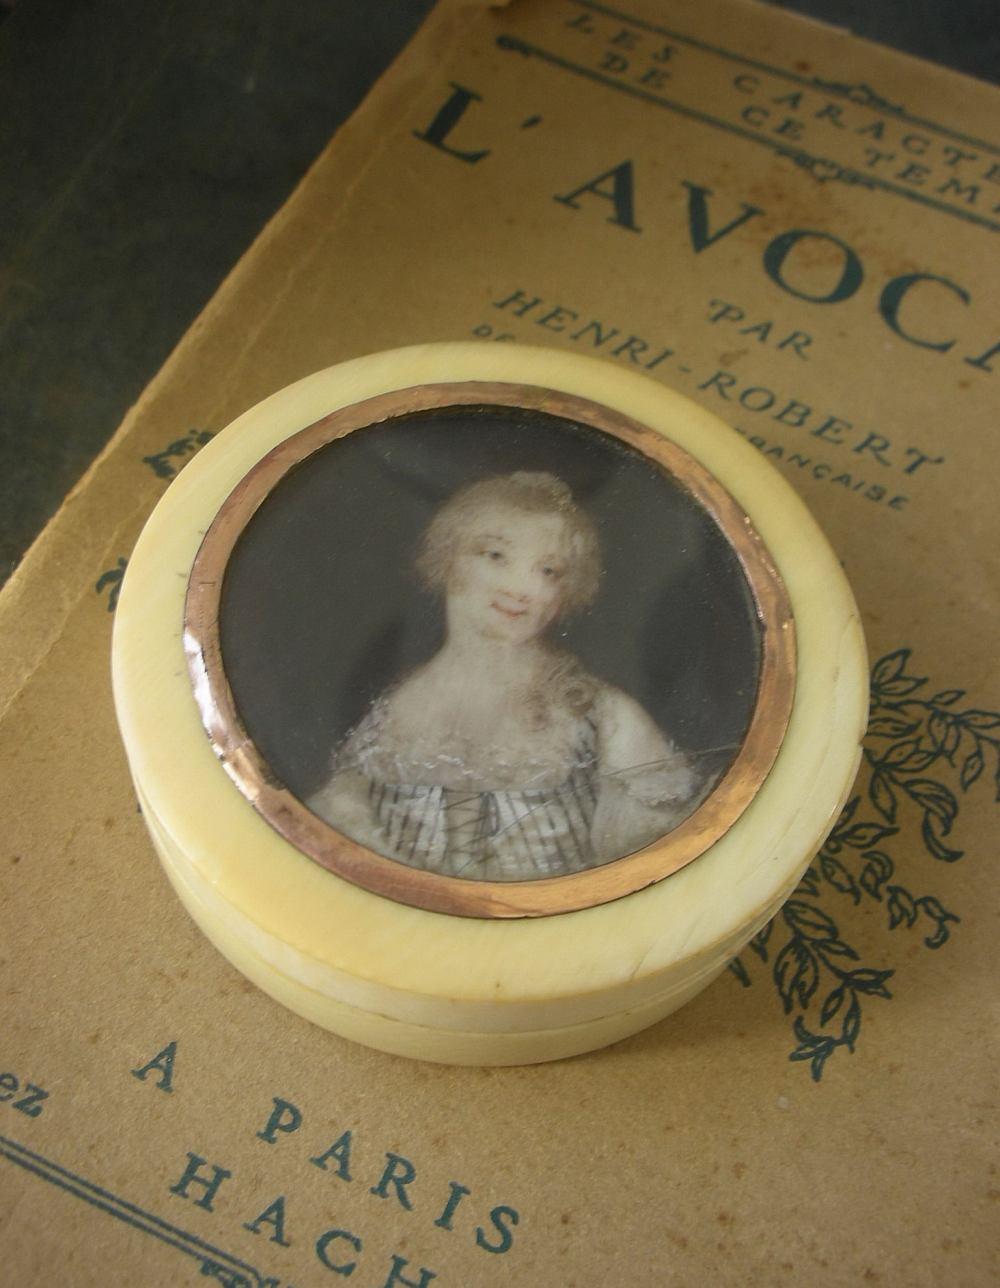 18th century portrait ivory box